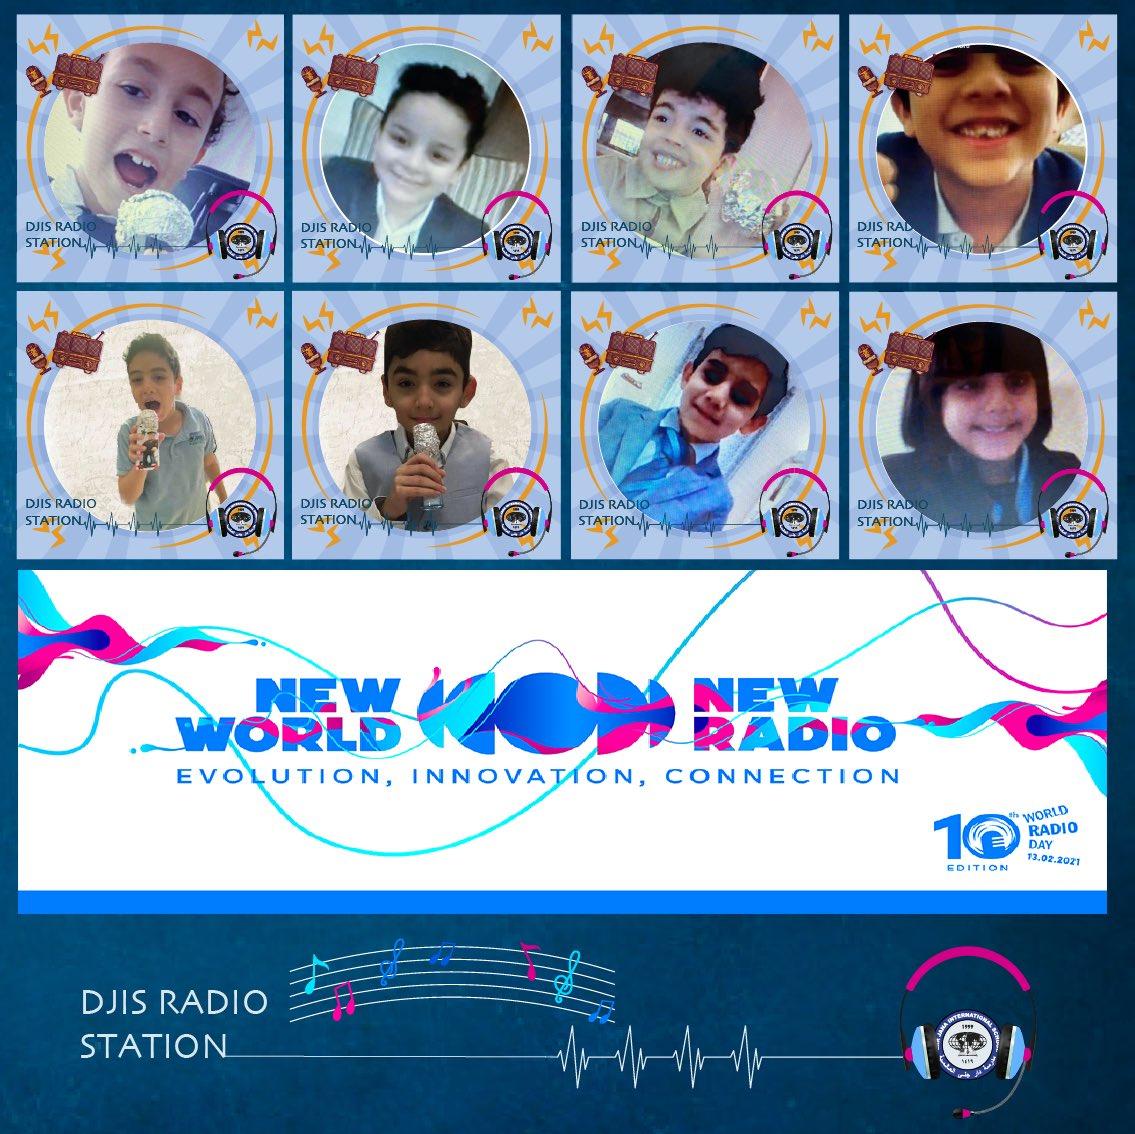 #kidsradio #worldradioday #radioday #worldradioday21